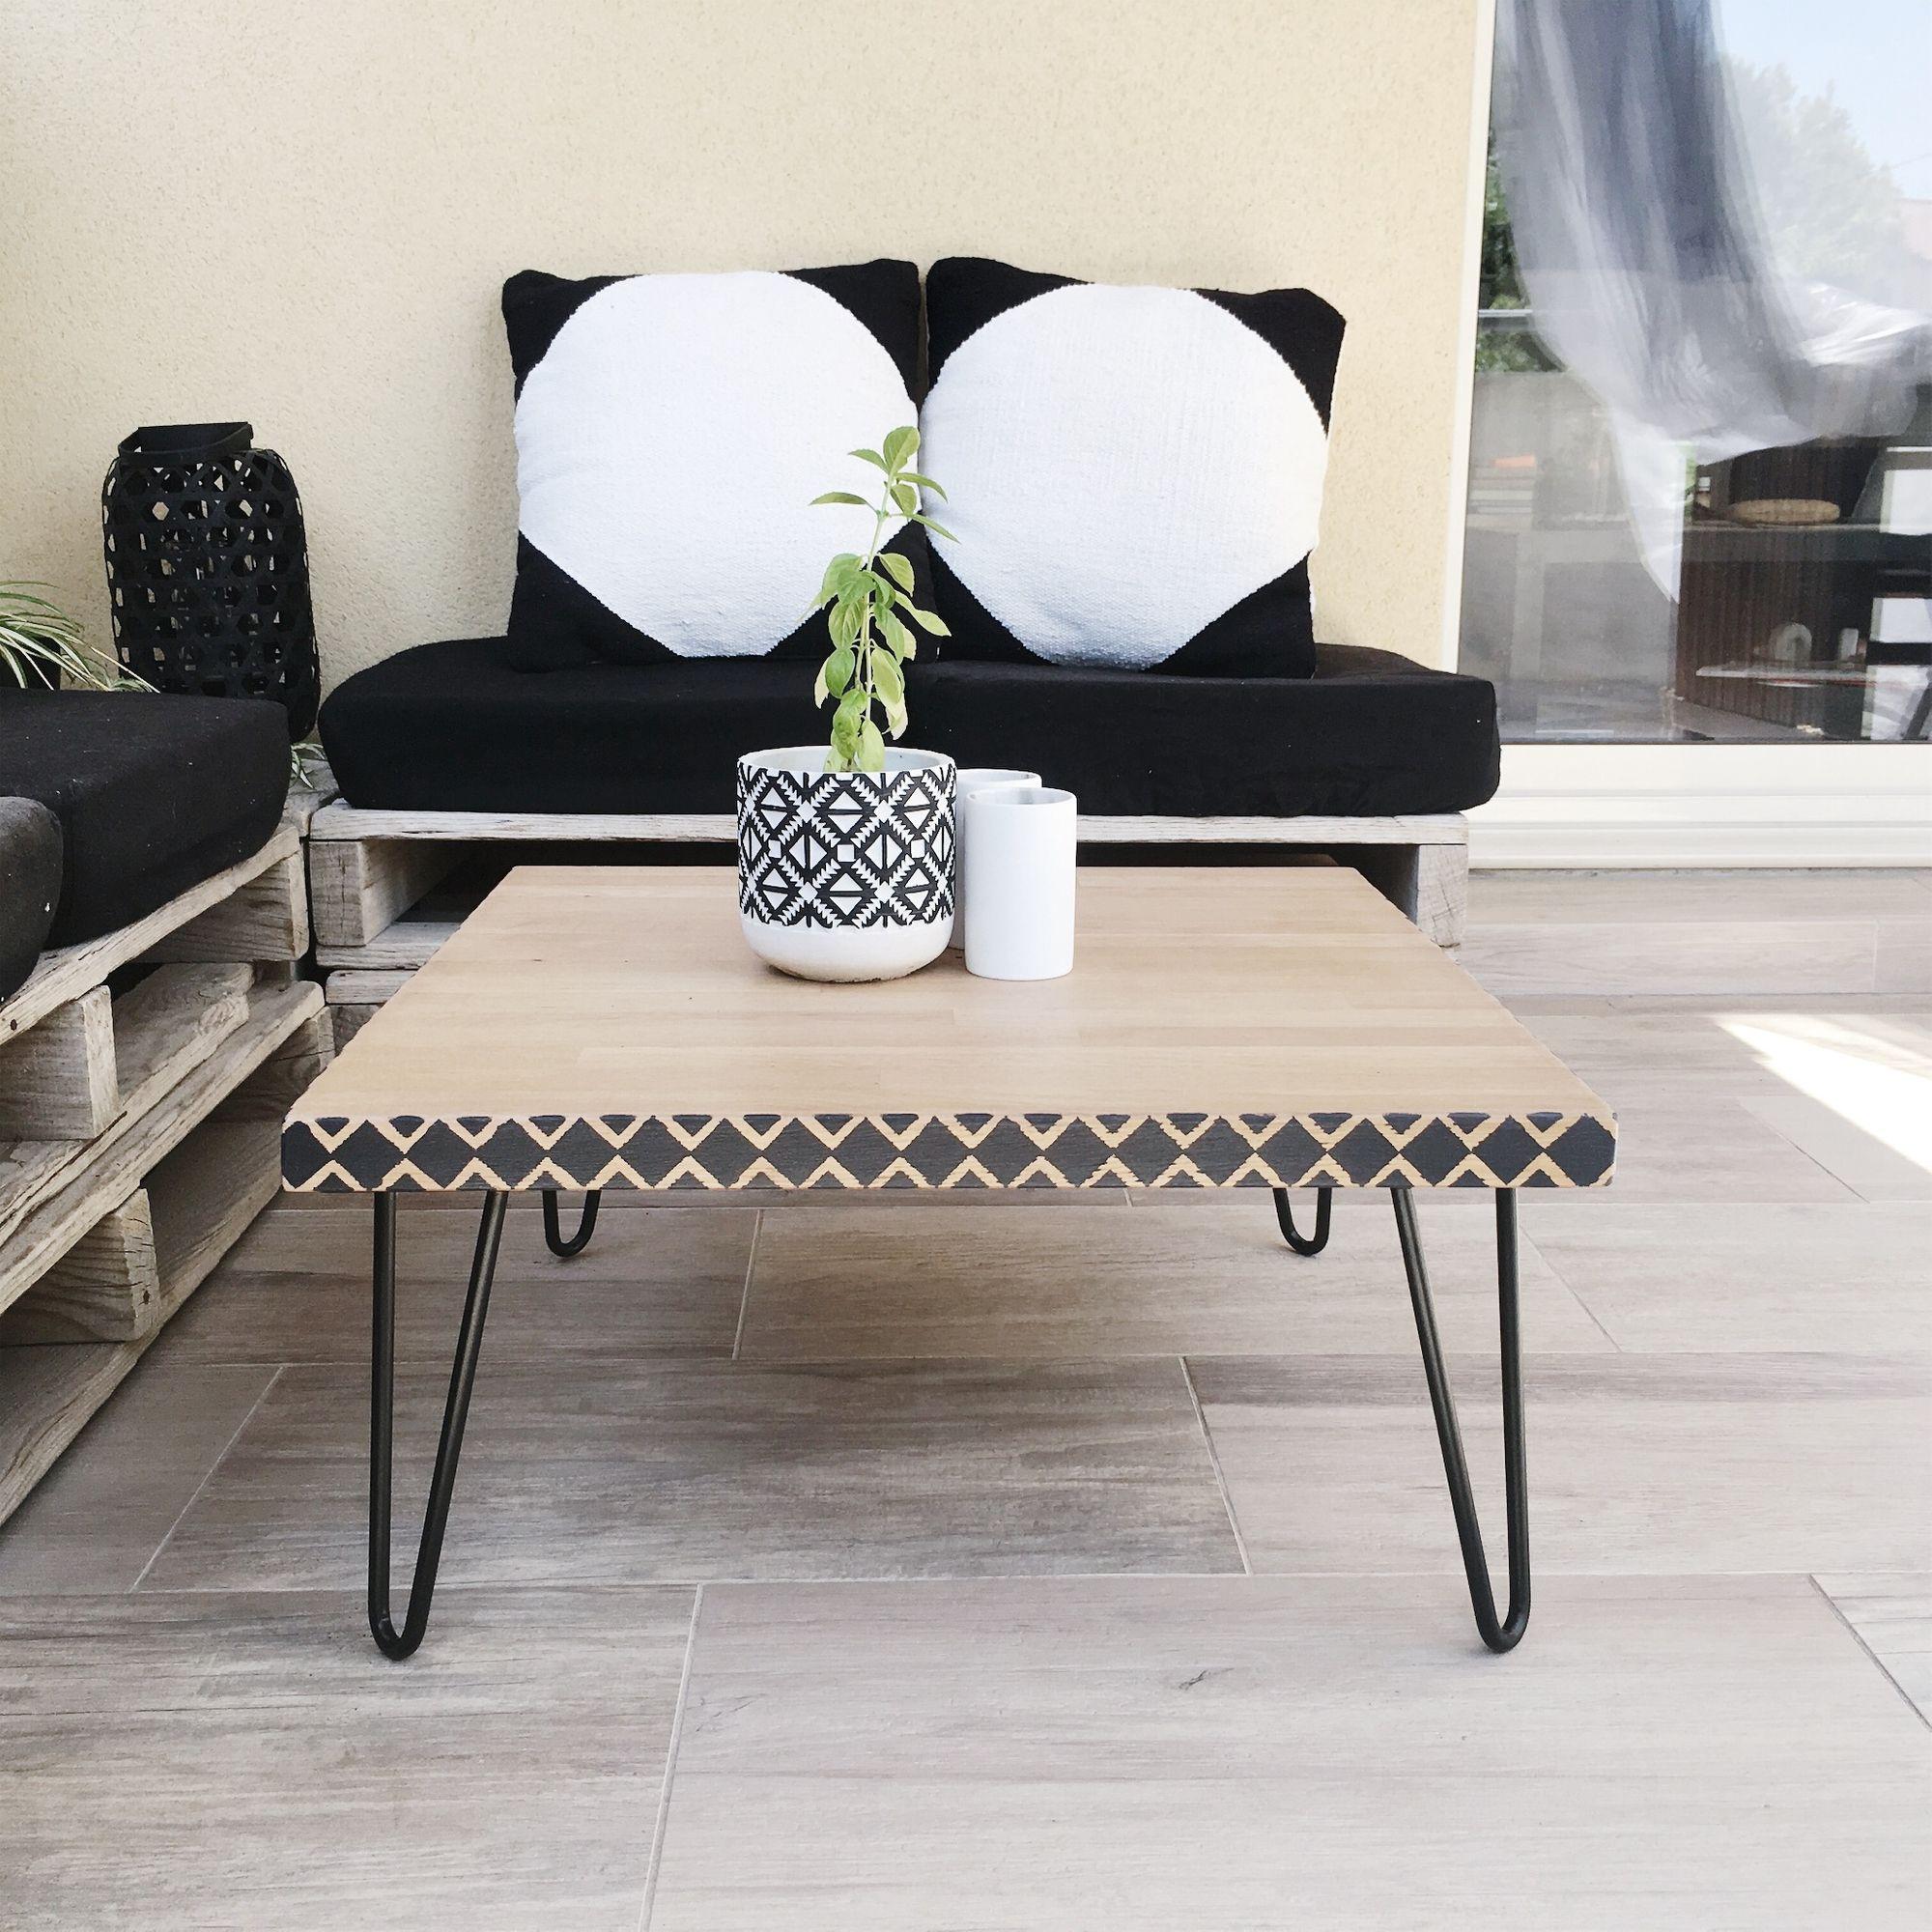 Diy Table Basse Ethnique Recycler Un Plan De Travail Diy Diydeco Styleethnique Diyforhome Ethnique Deco Decoration Decoet Diy Deco Deco Deco Ethnique